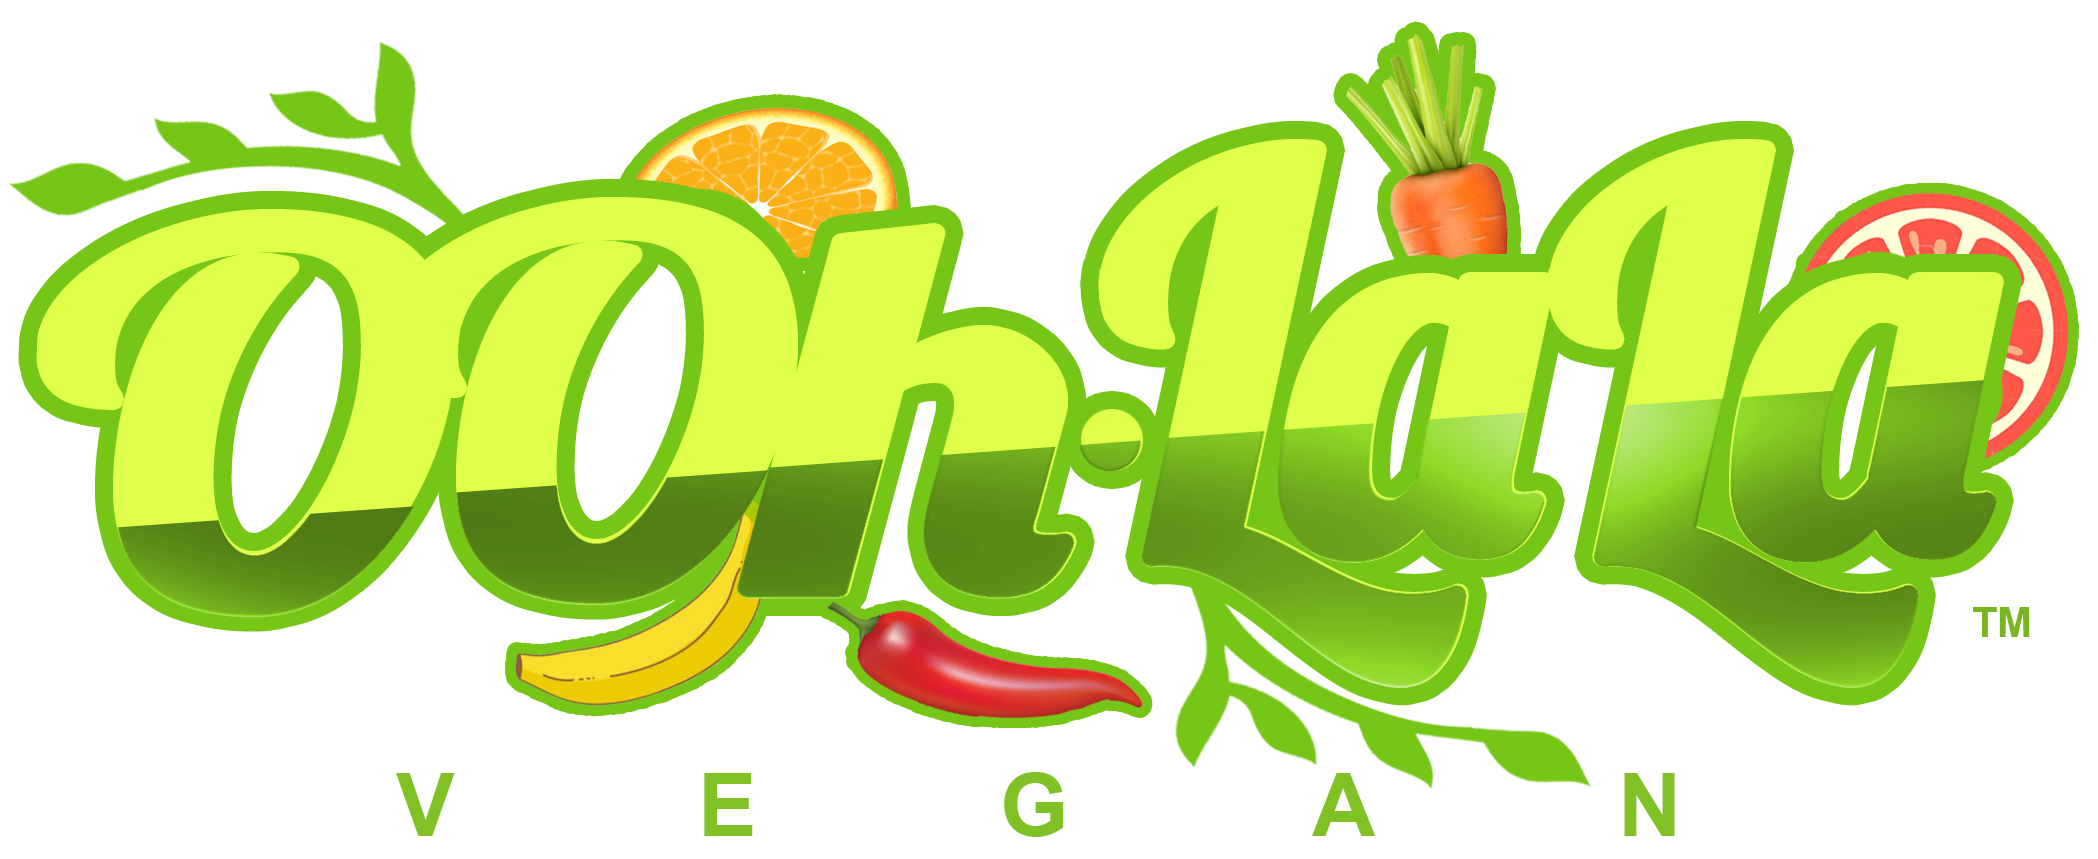 Ooh La La Vegan LLC